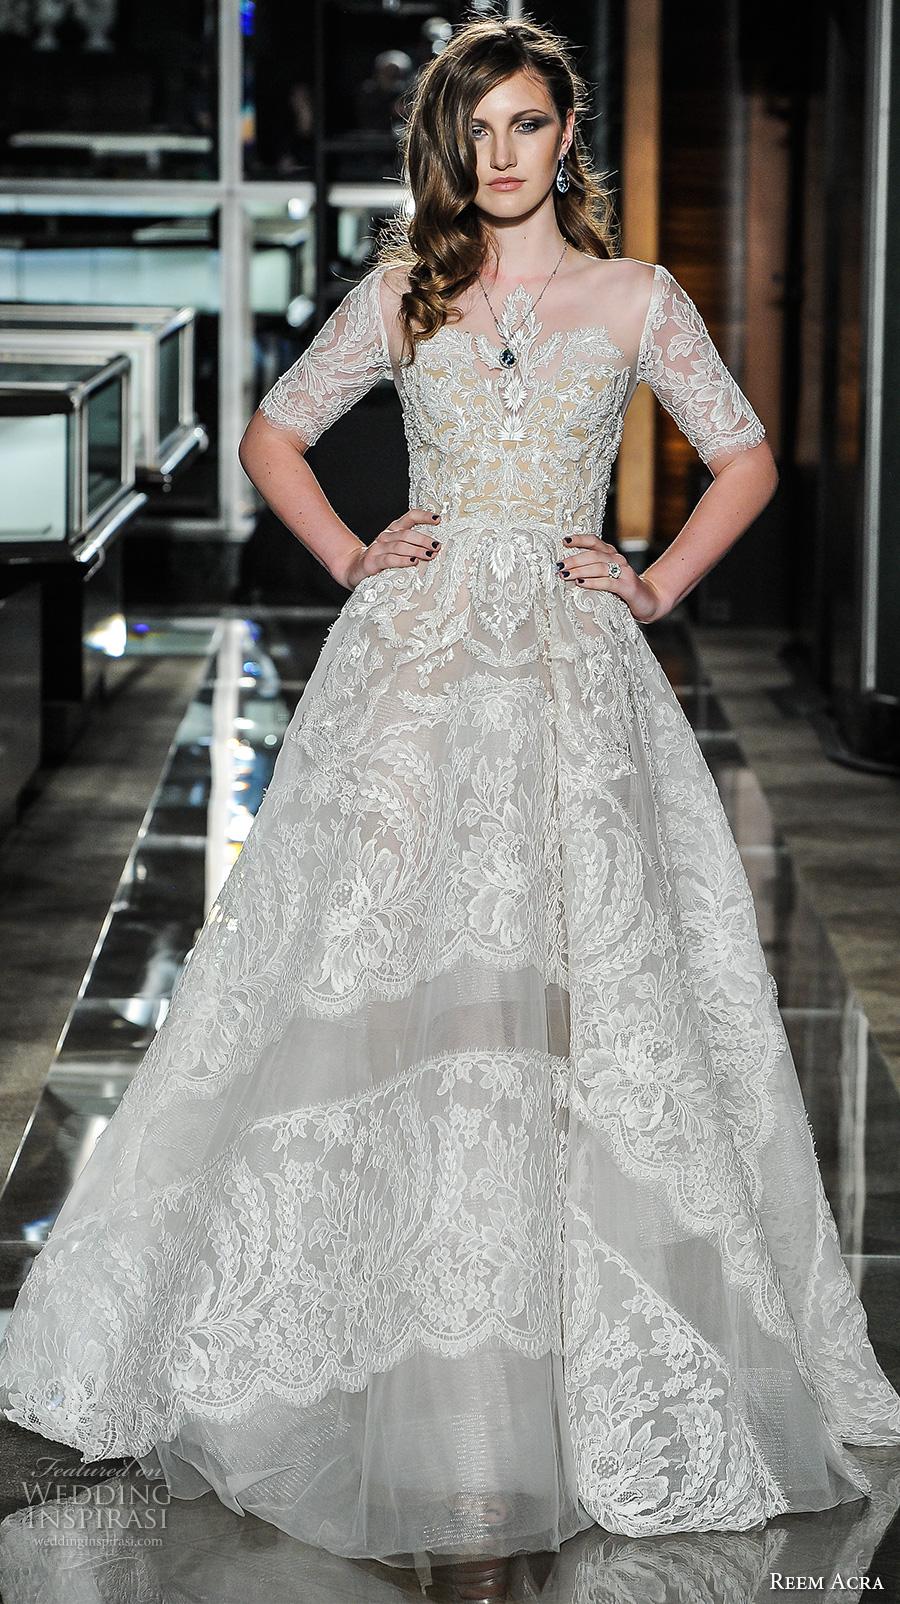 Reem Acra Wedding Gown 40 Spectacular reem acra spring bridal